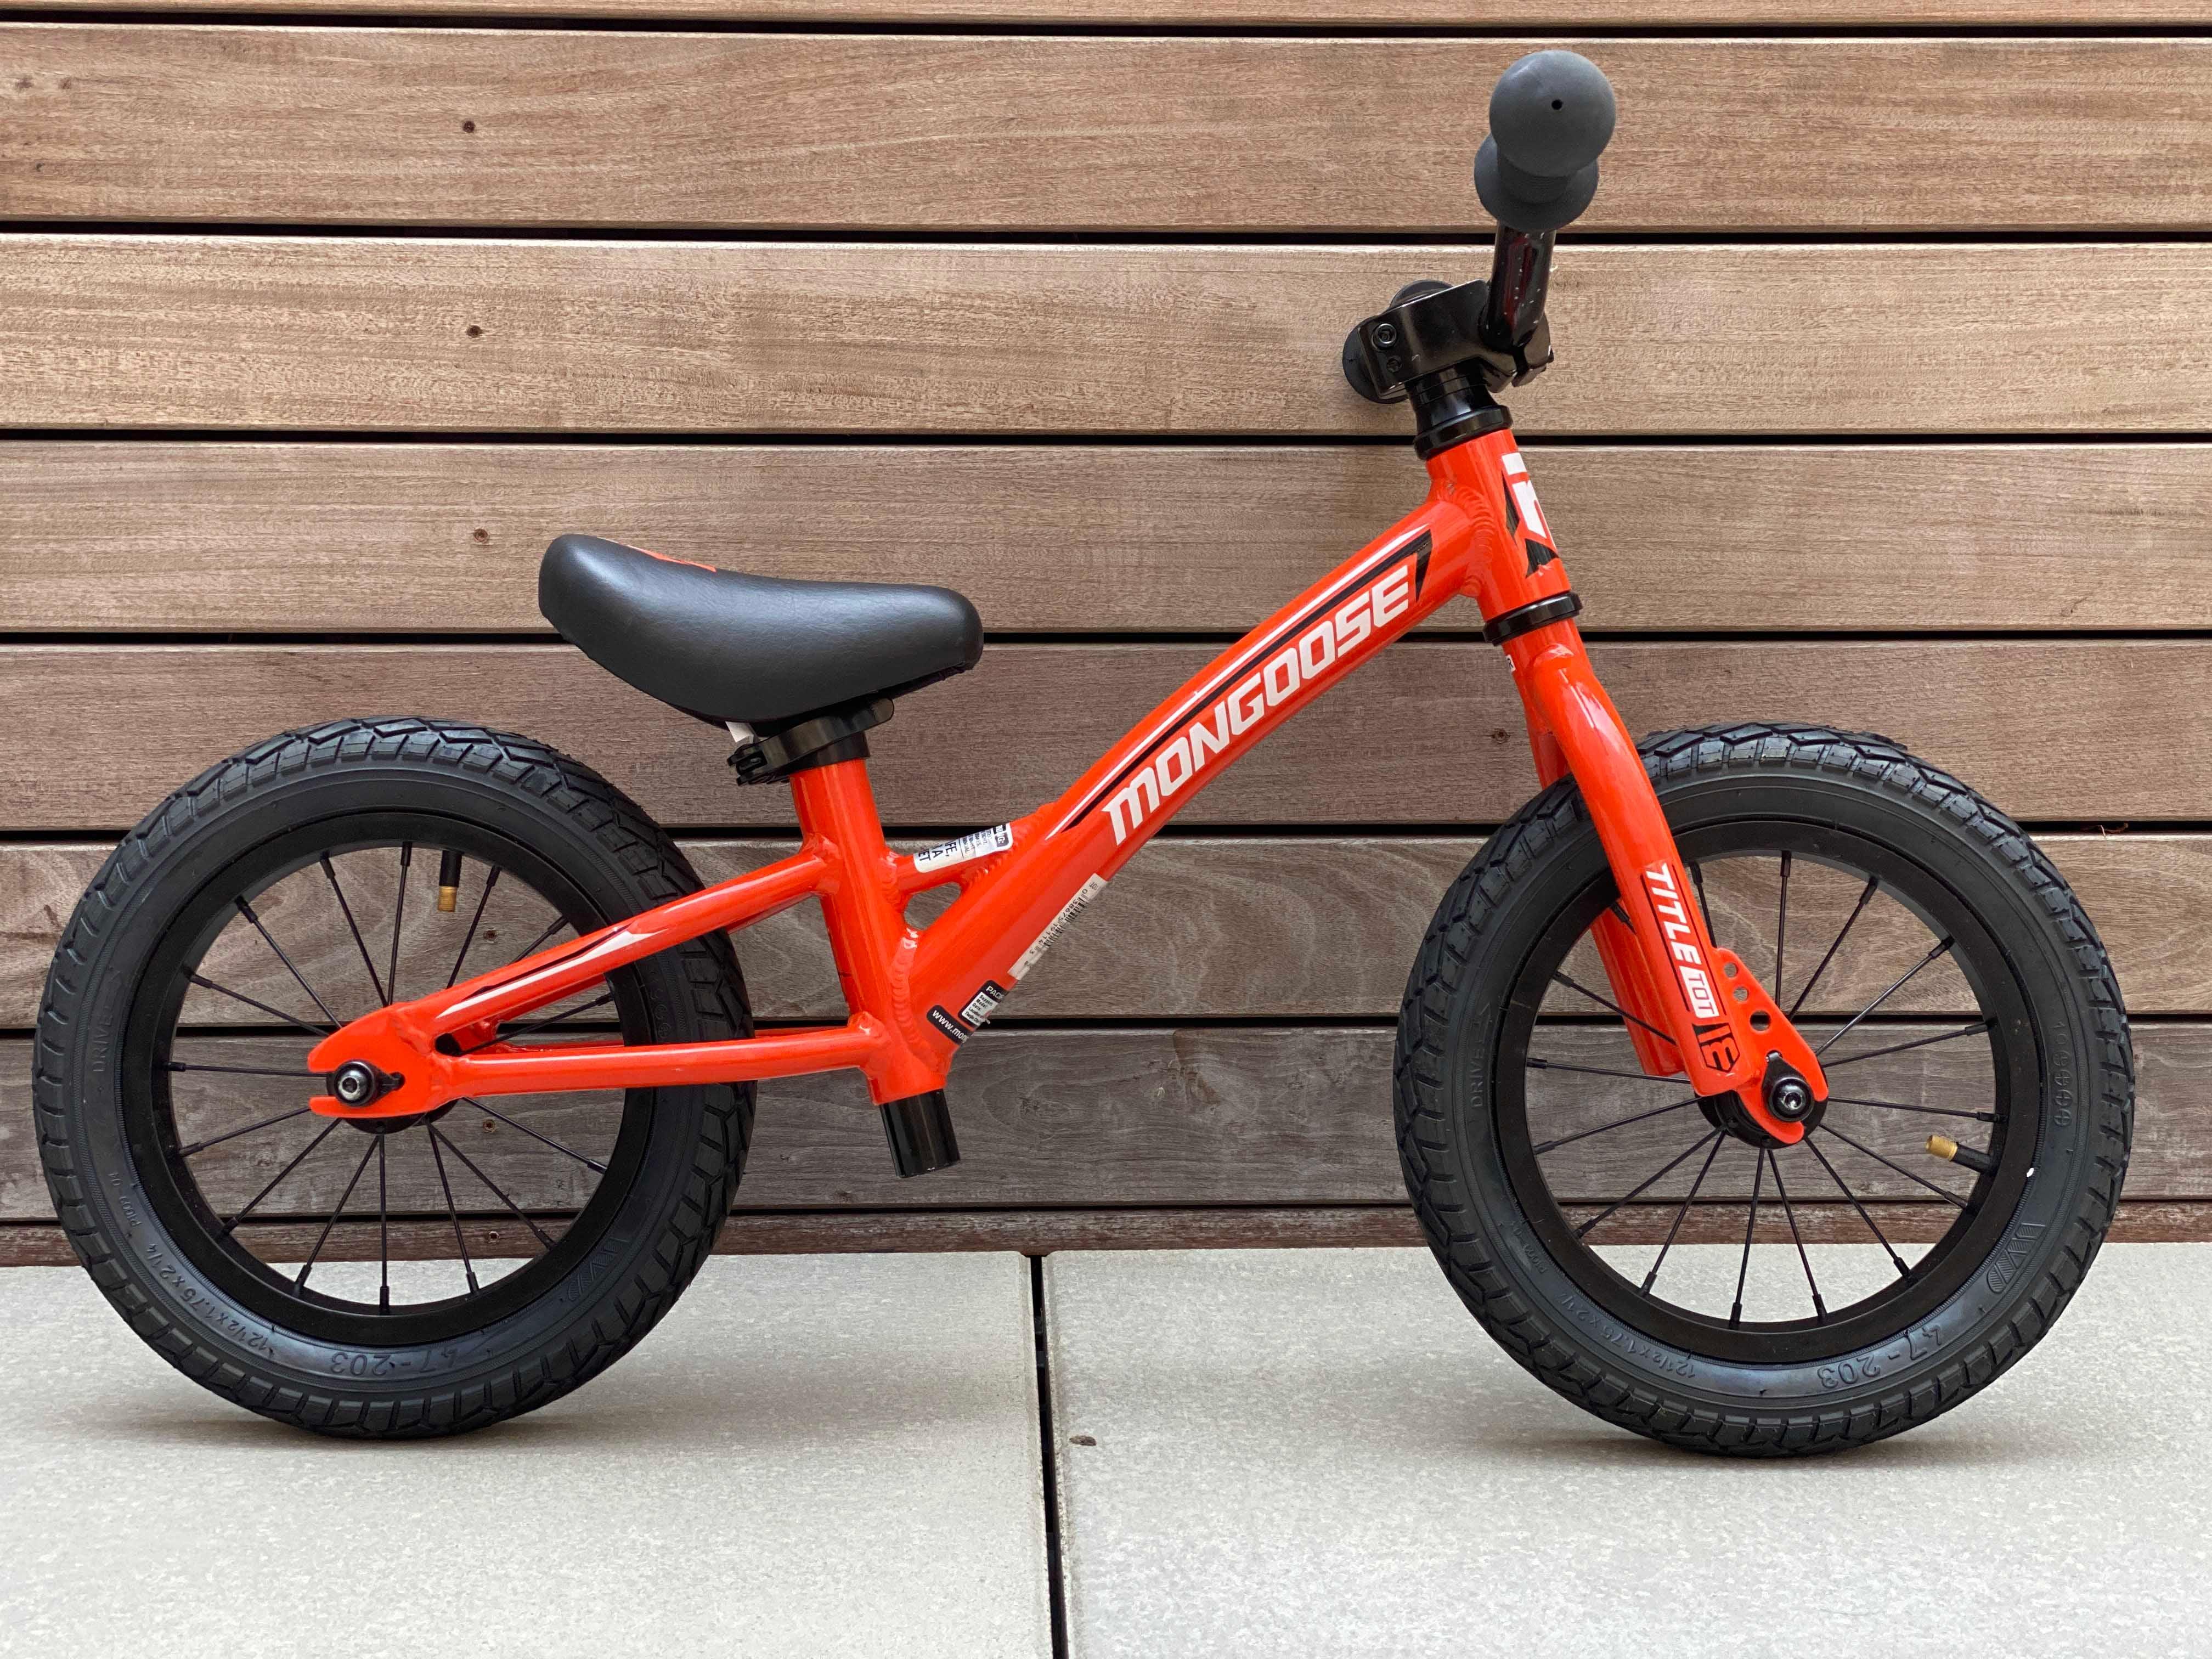 Orange and black balance bike sans pedals